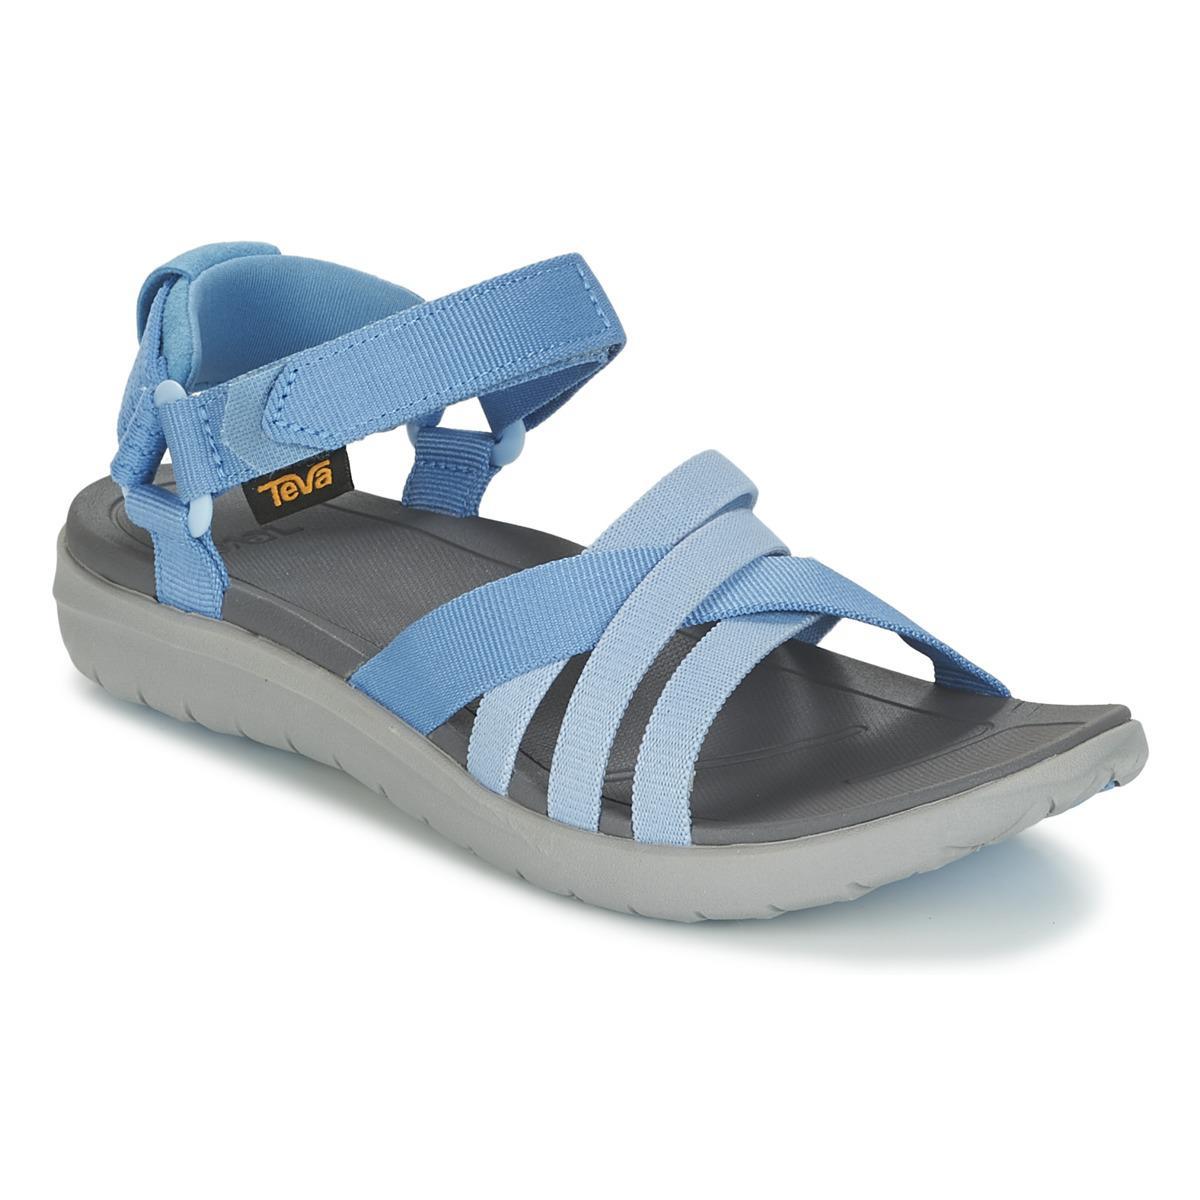 43cdd1573faa Teva Sanborn Sandal Women s Sandals In Blue in Blue - Save 20% - Lyst